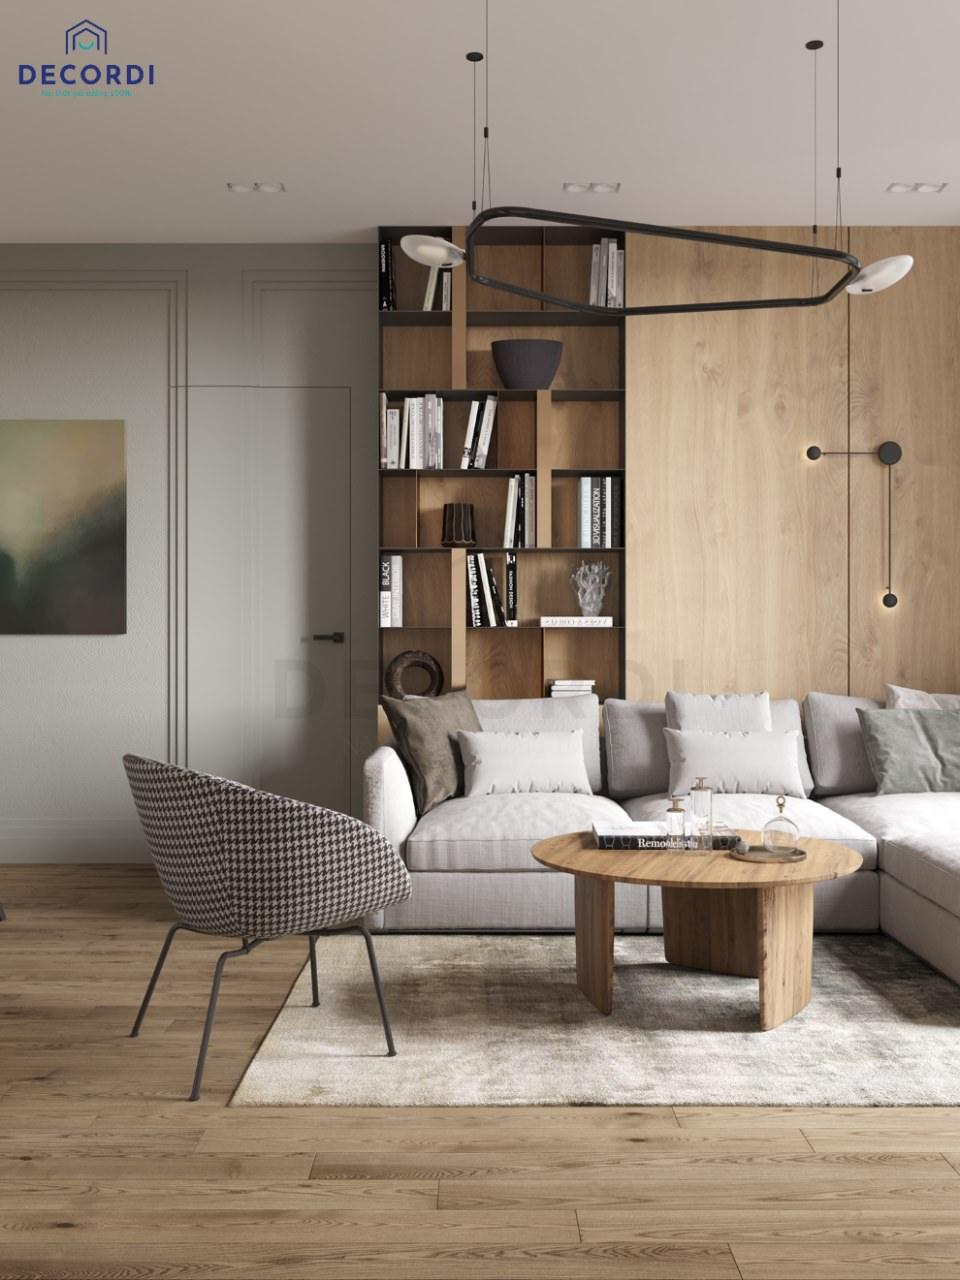 sofa phong khach chung cu decordi 1